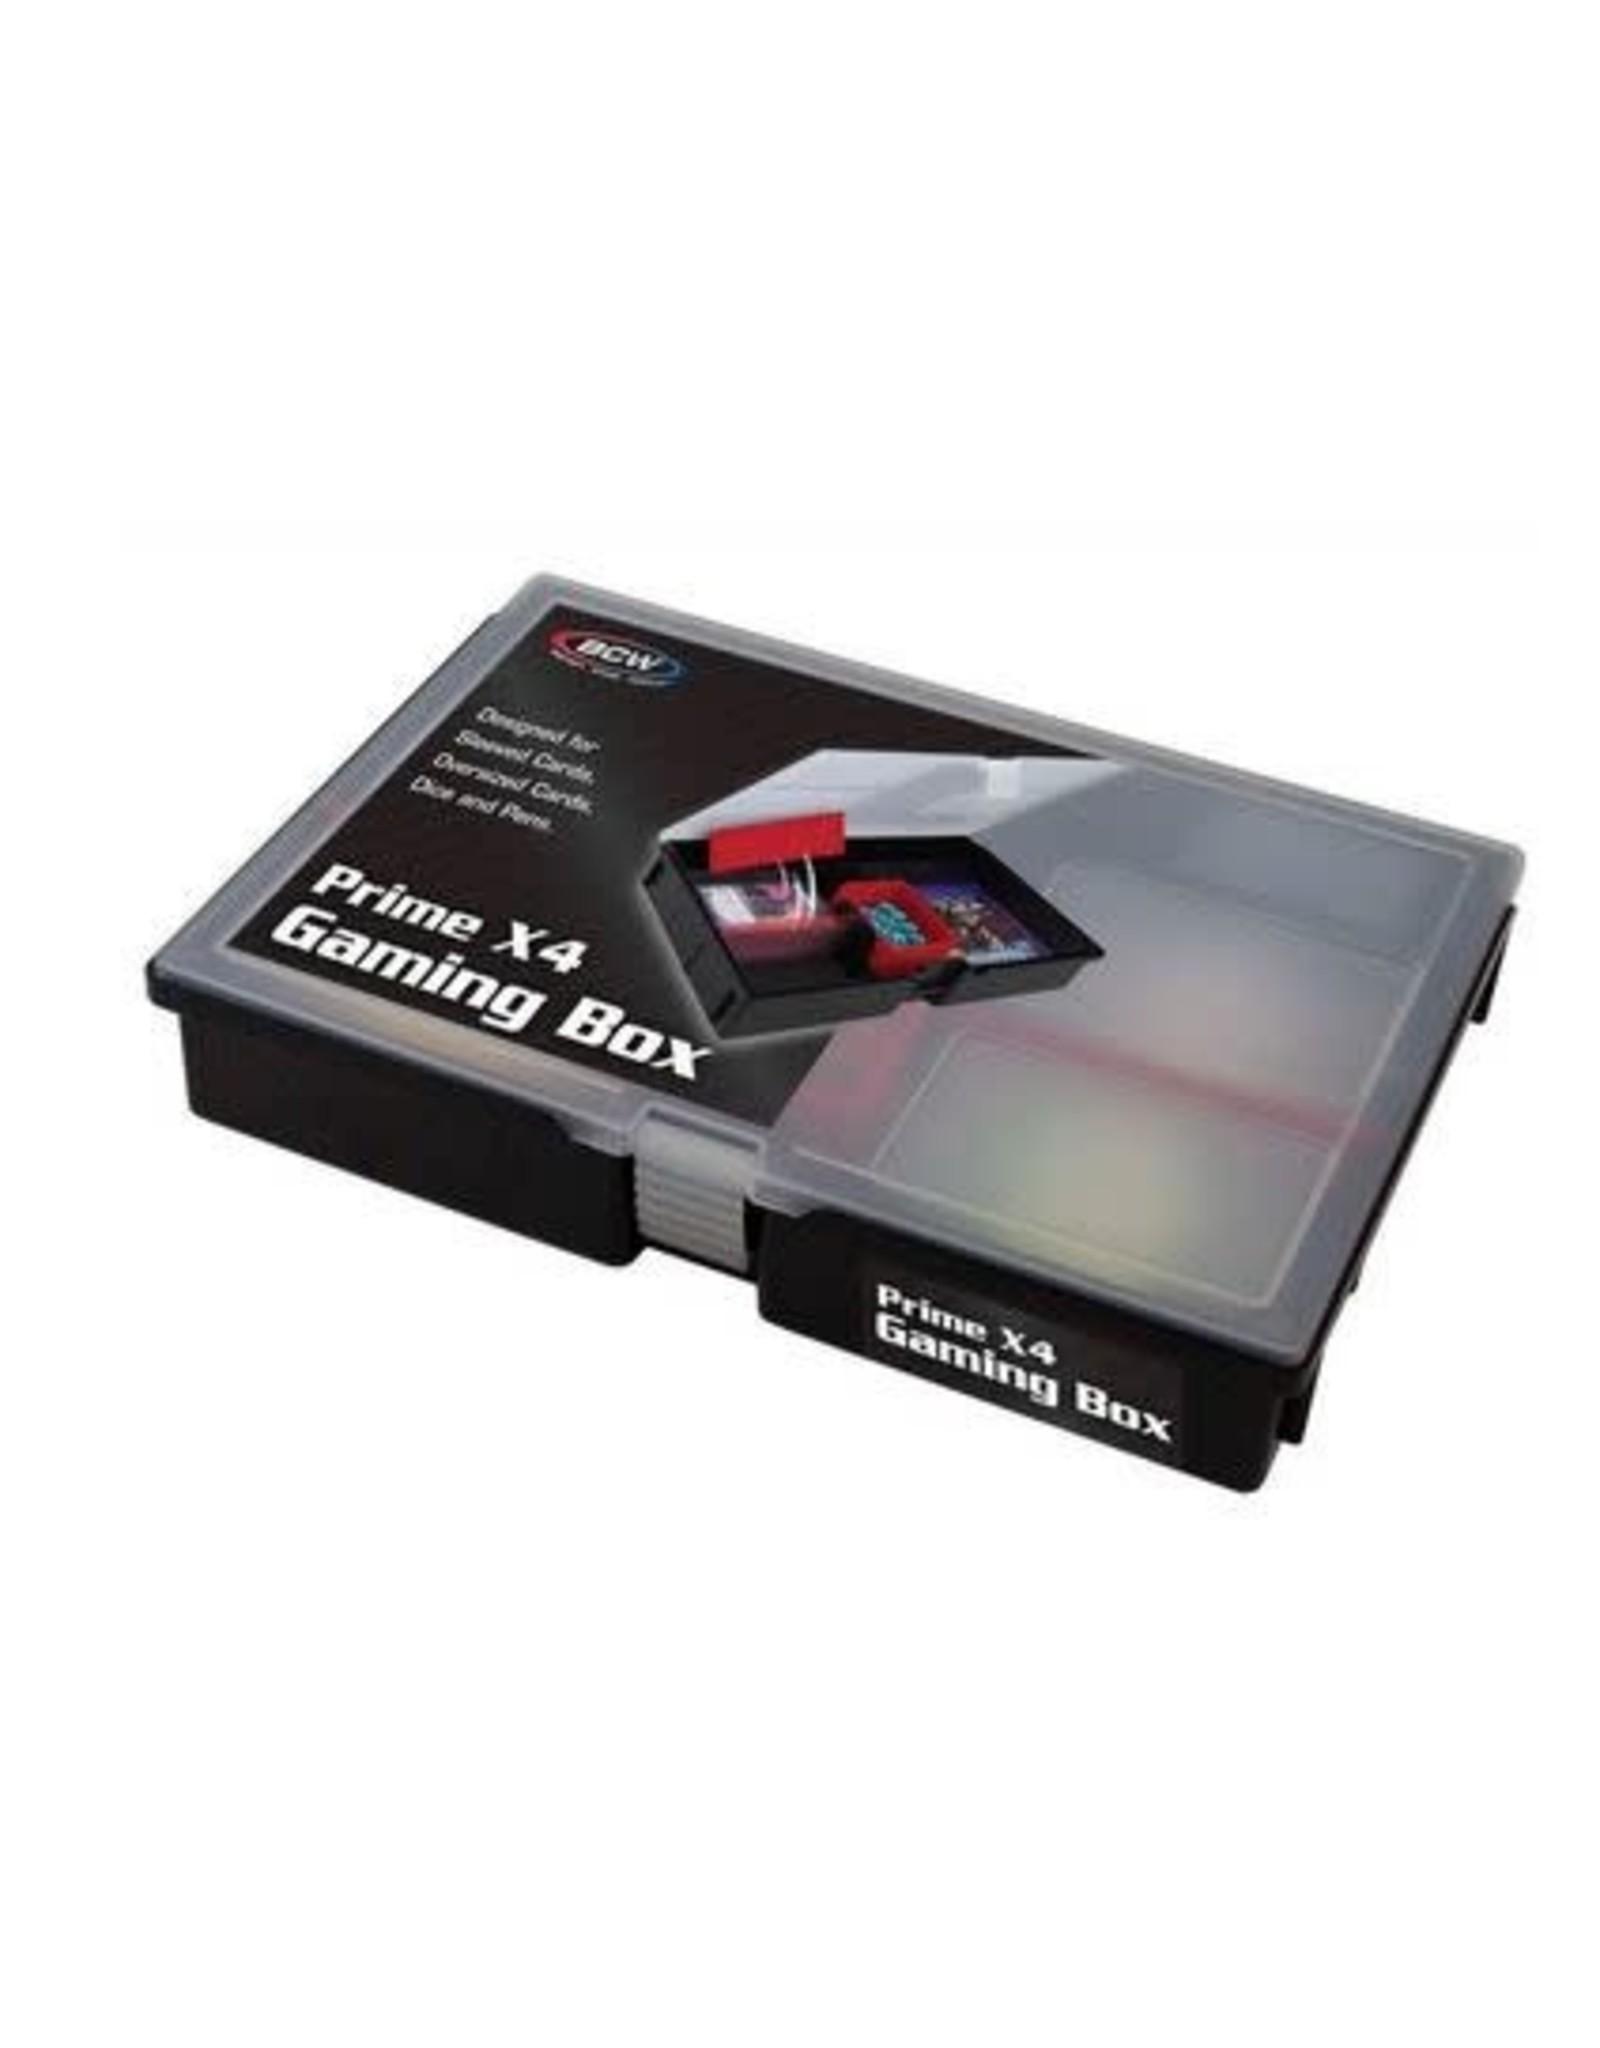 BCW: Prime x4 Gaming Box